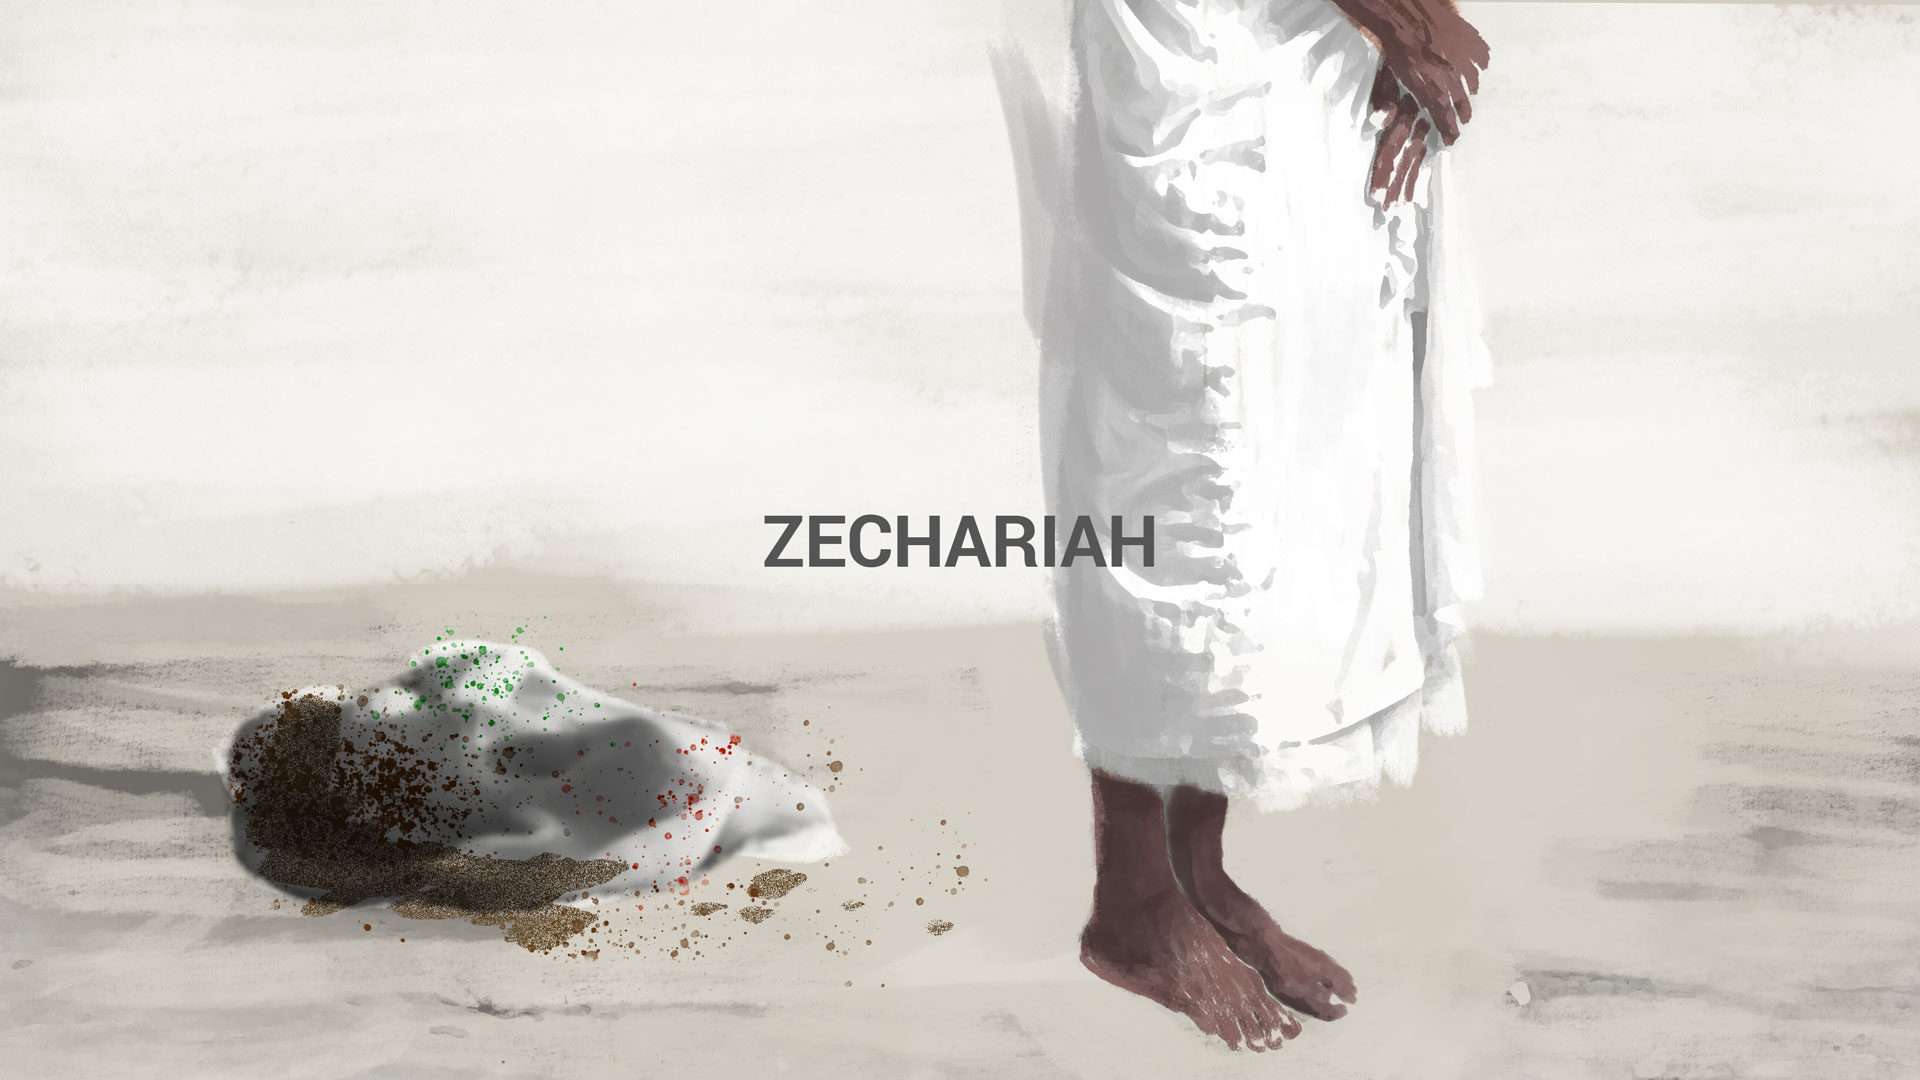 zechariah_1_main_edit.jpg